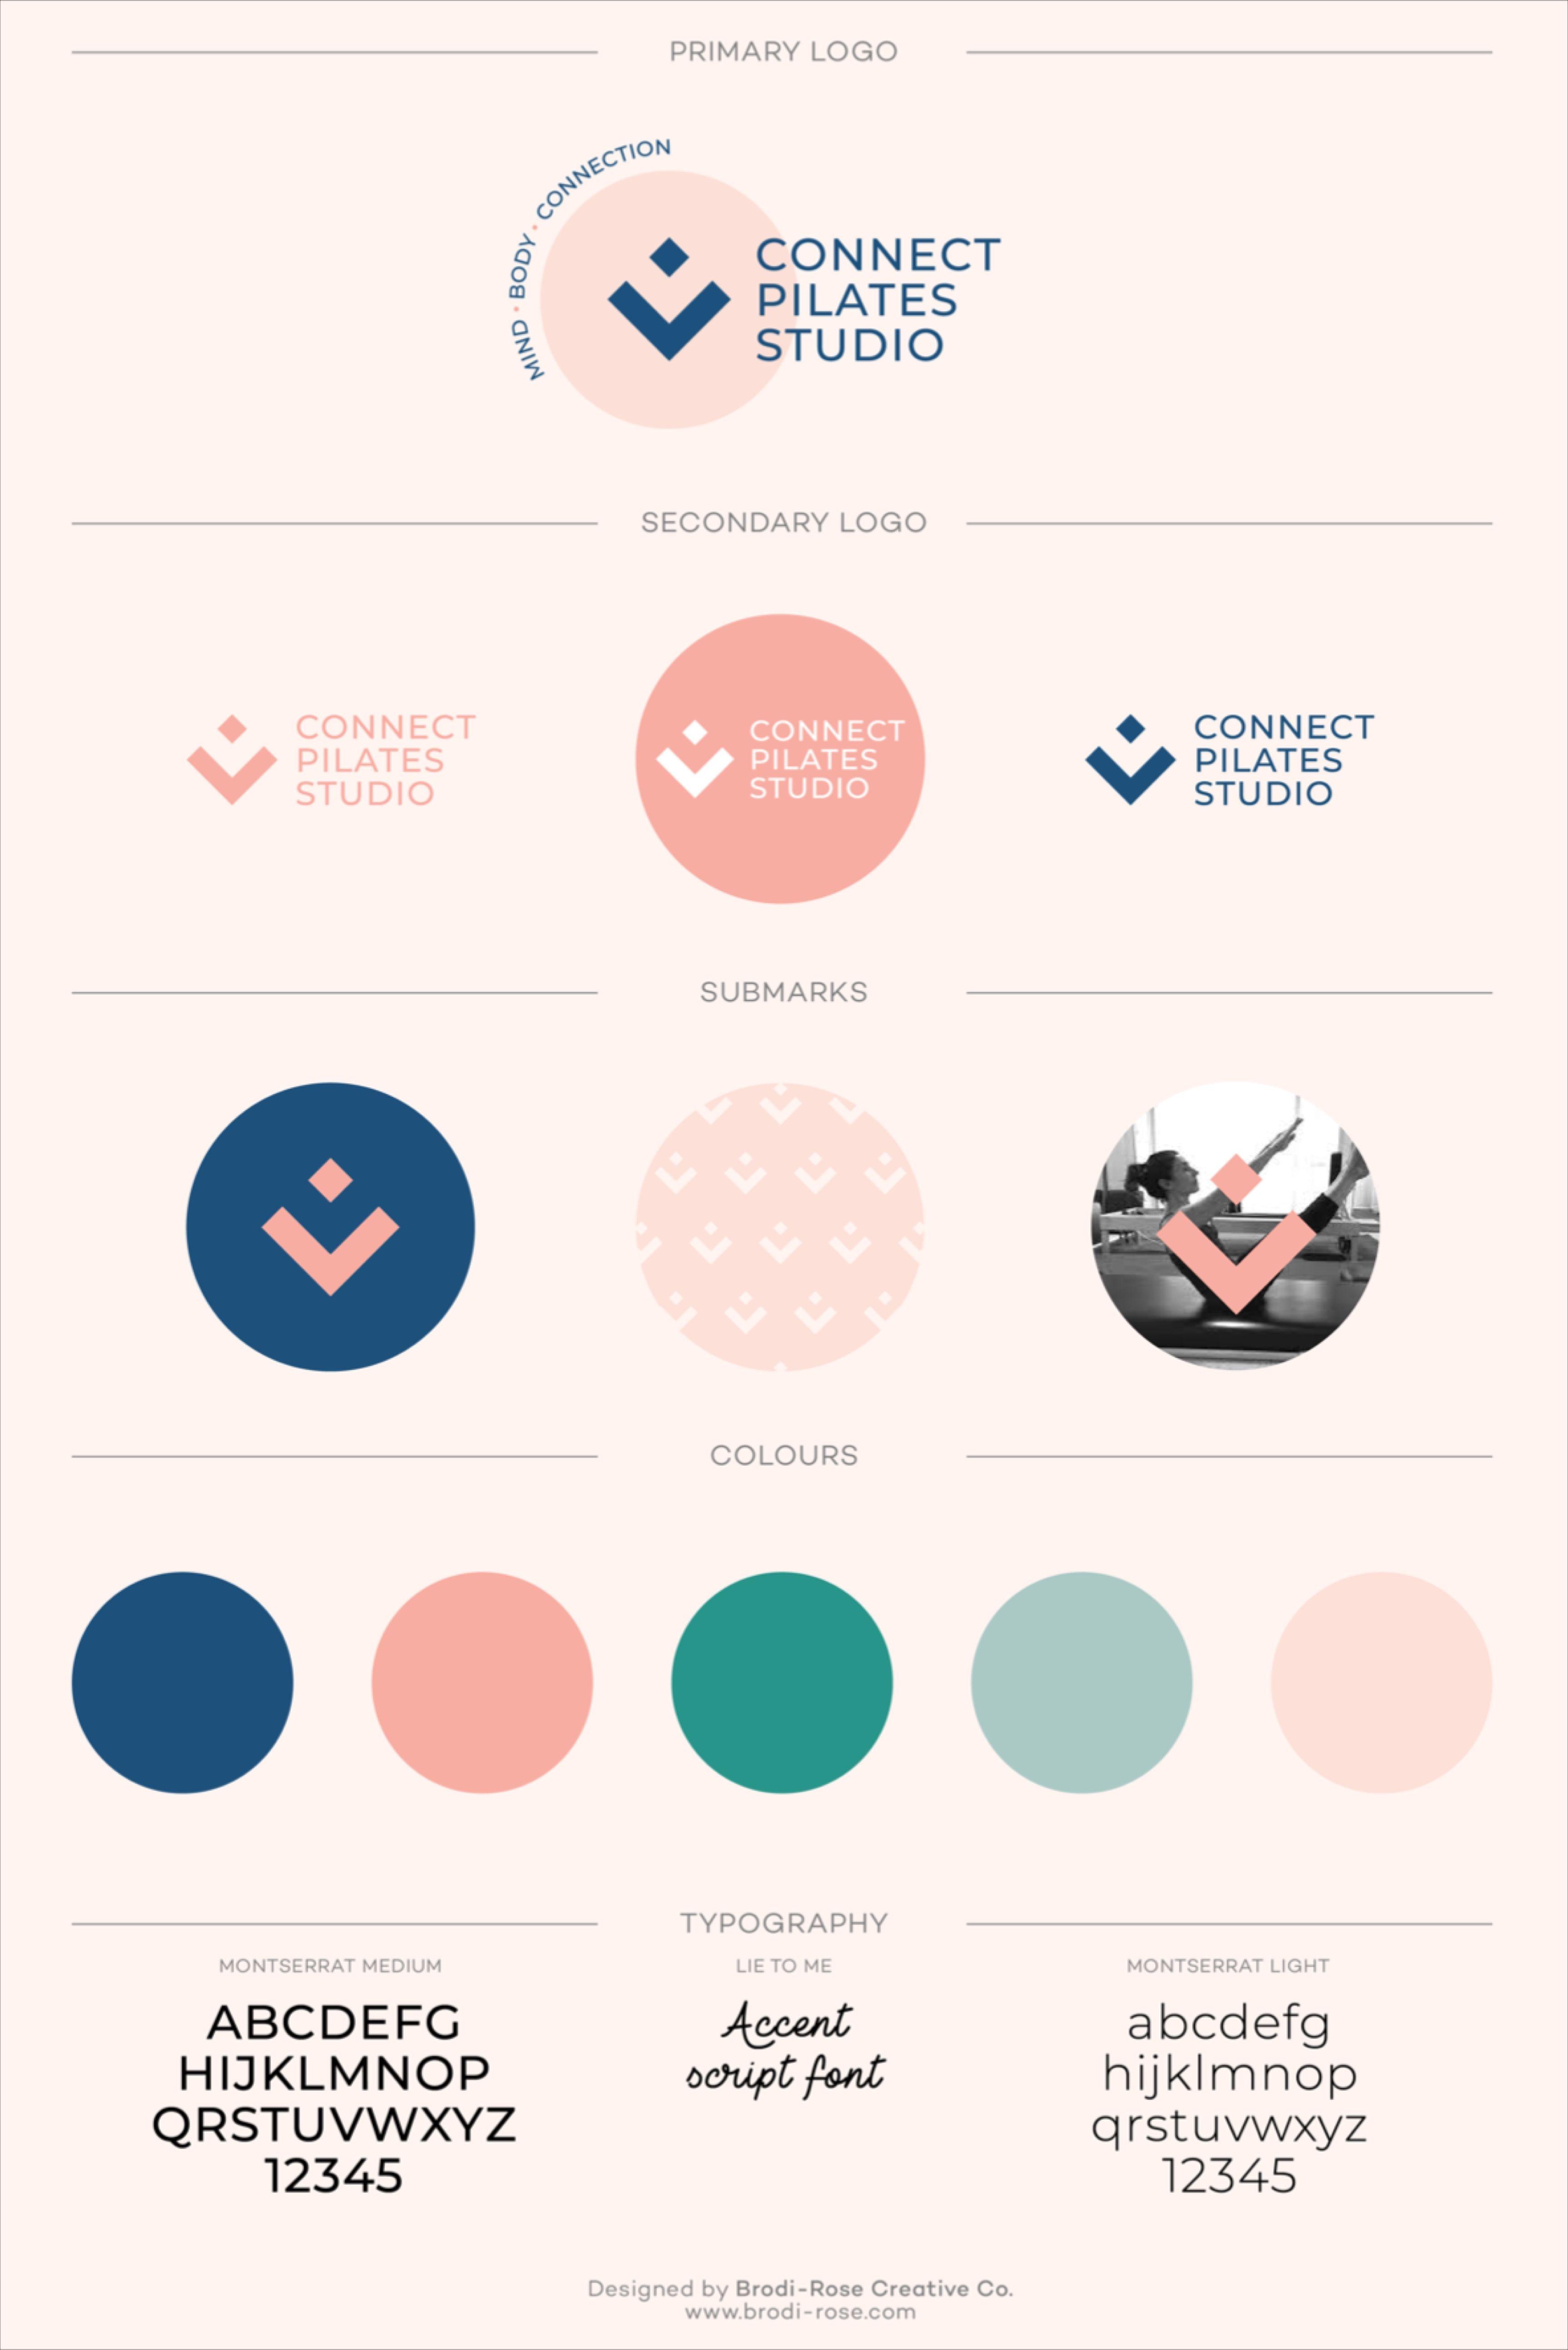 Connect pilates studio brand design in 2020 branding